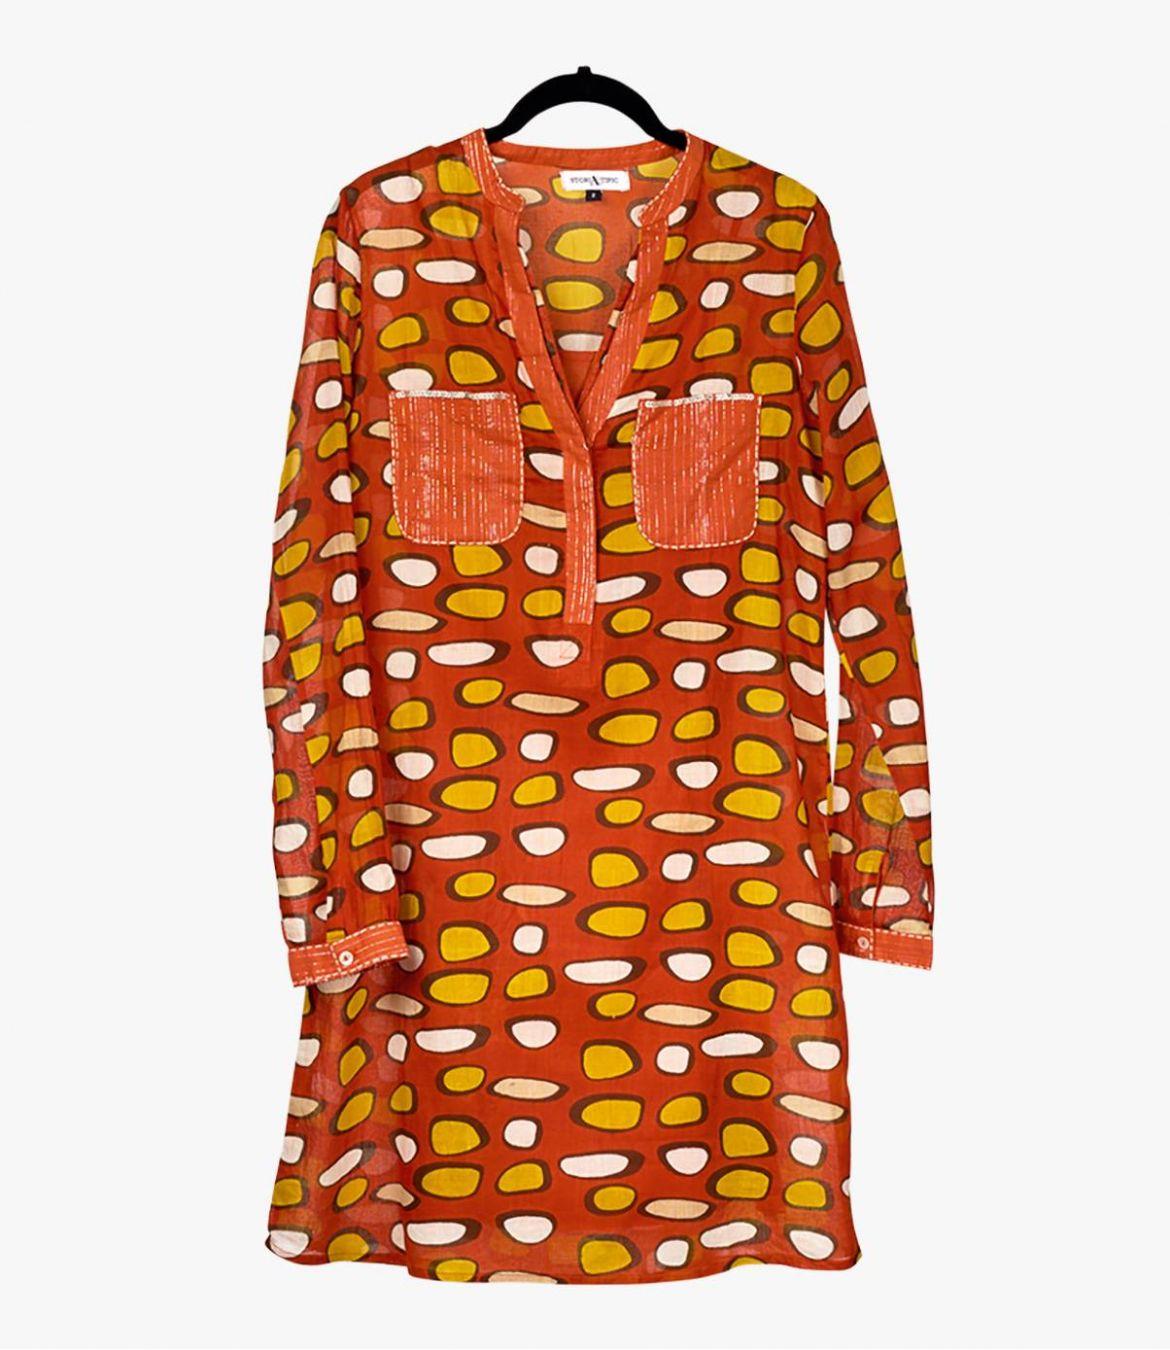 SONG GALET Robe en Coton pour Femme Storiatipic - 2